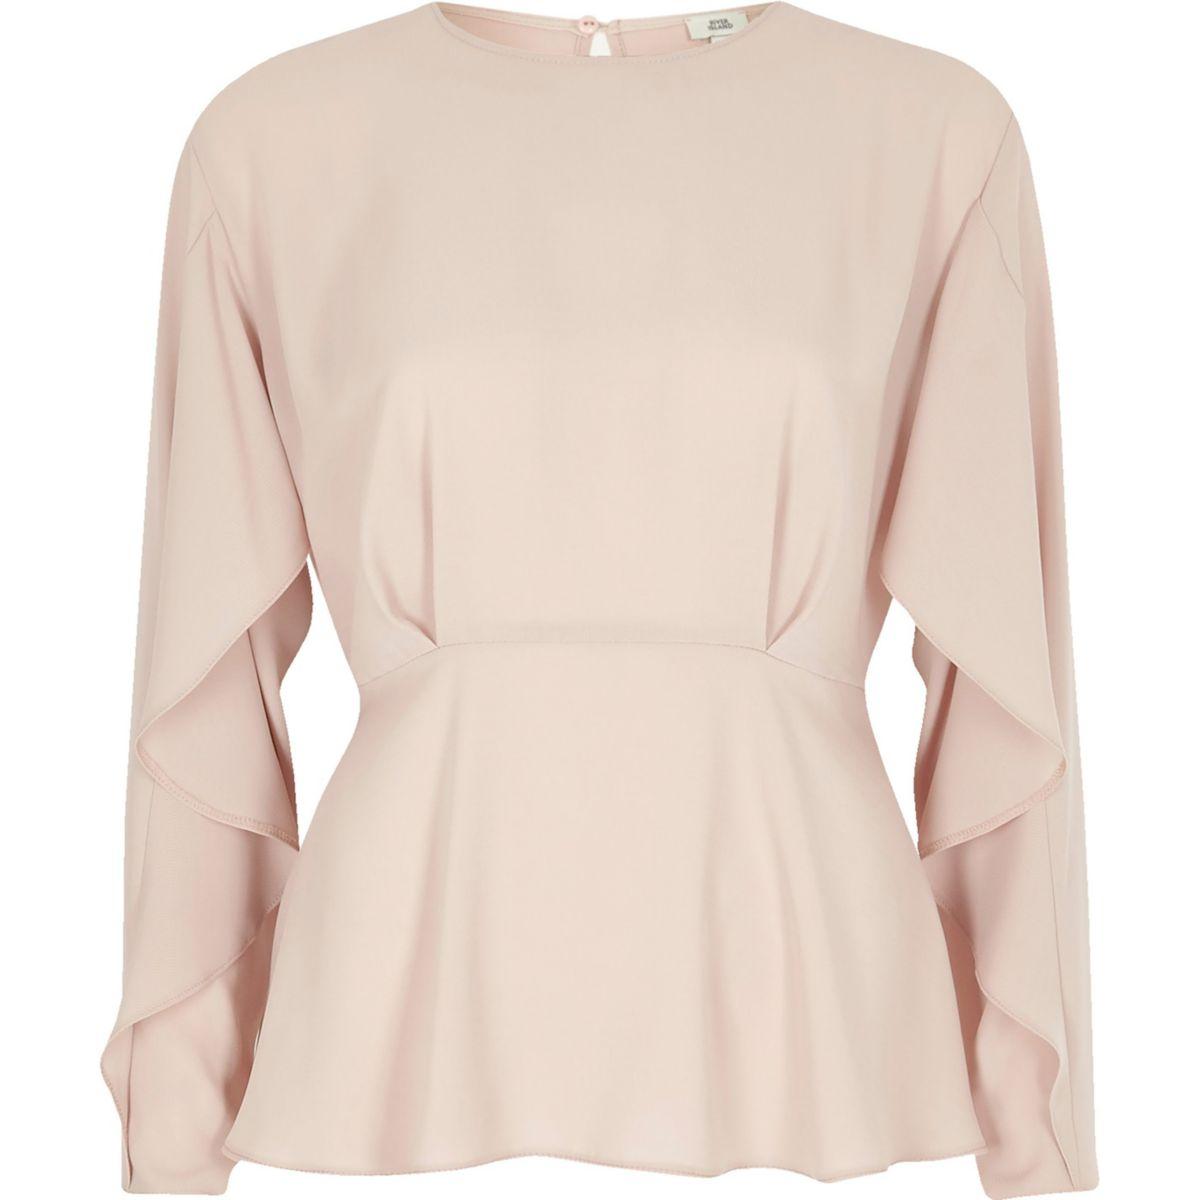 Light pink frill long sleeve blouse